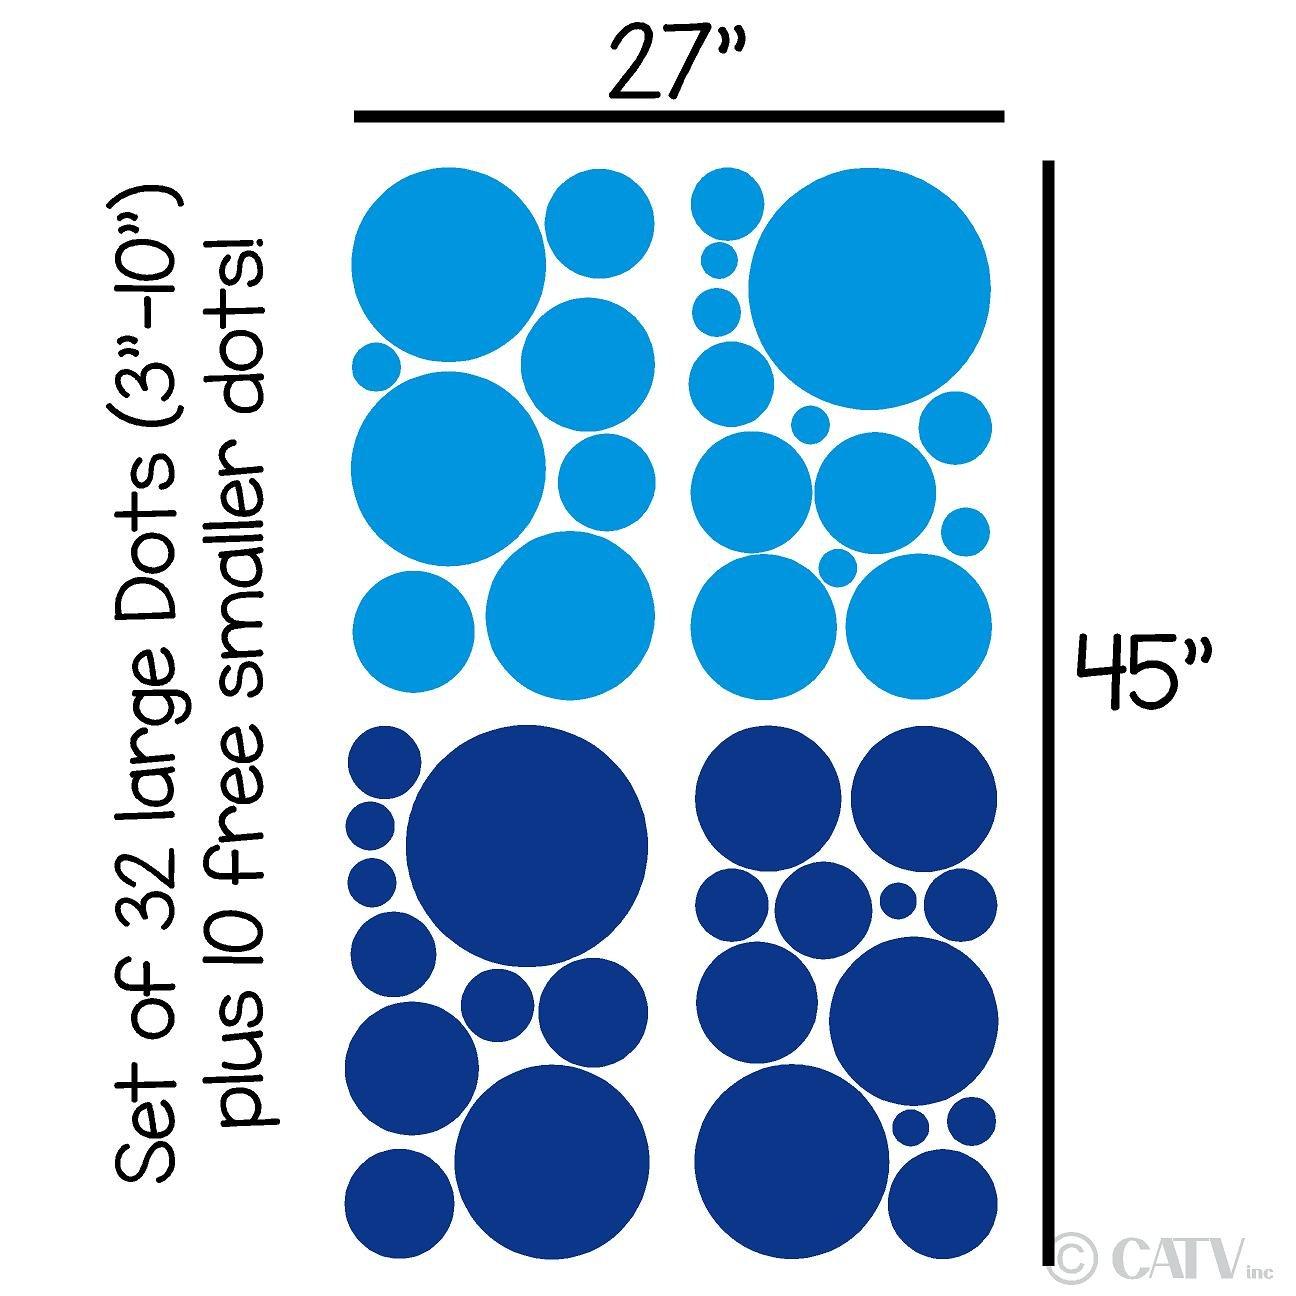 Assorted Vinyl Polka Dots circle wall decals vinyl stickers nursery decor (Blue & Light Blue/set of 32)